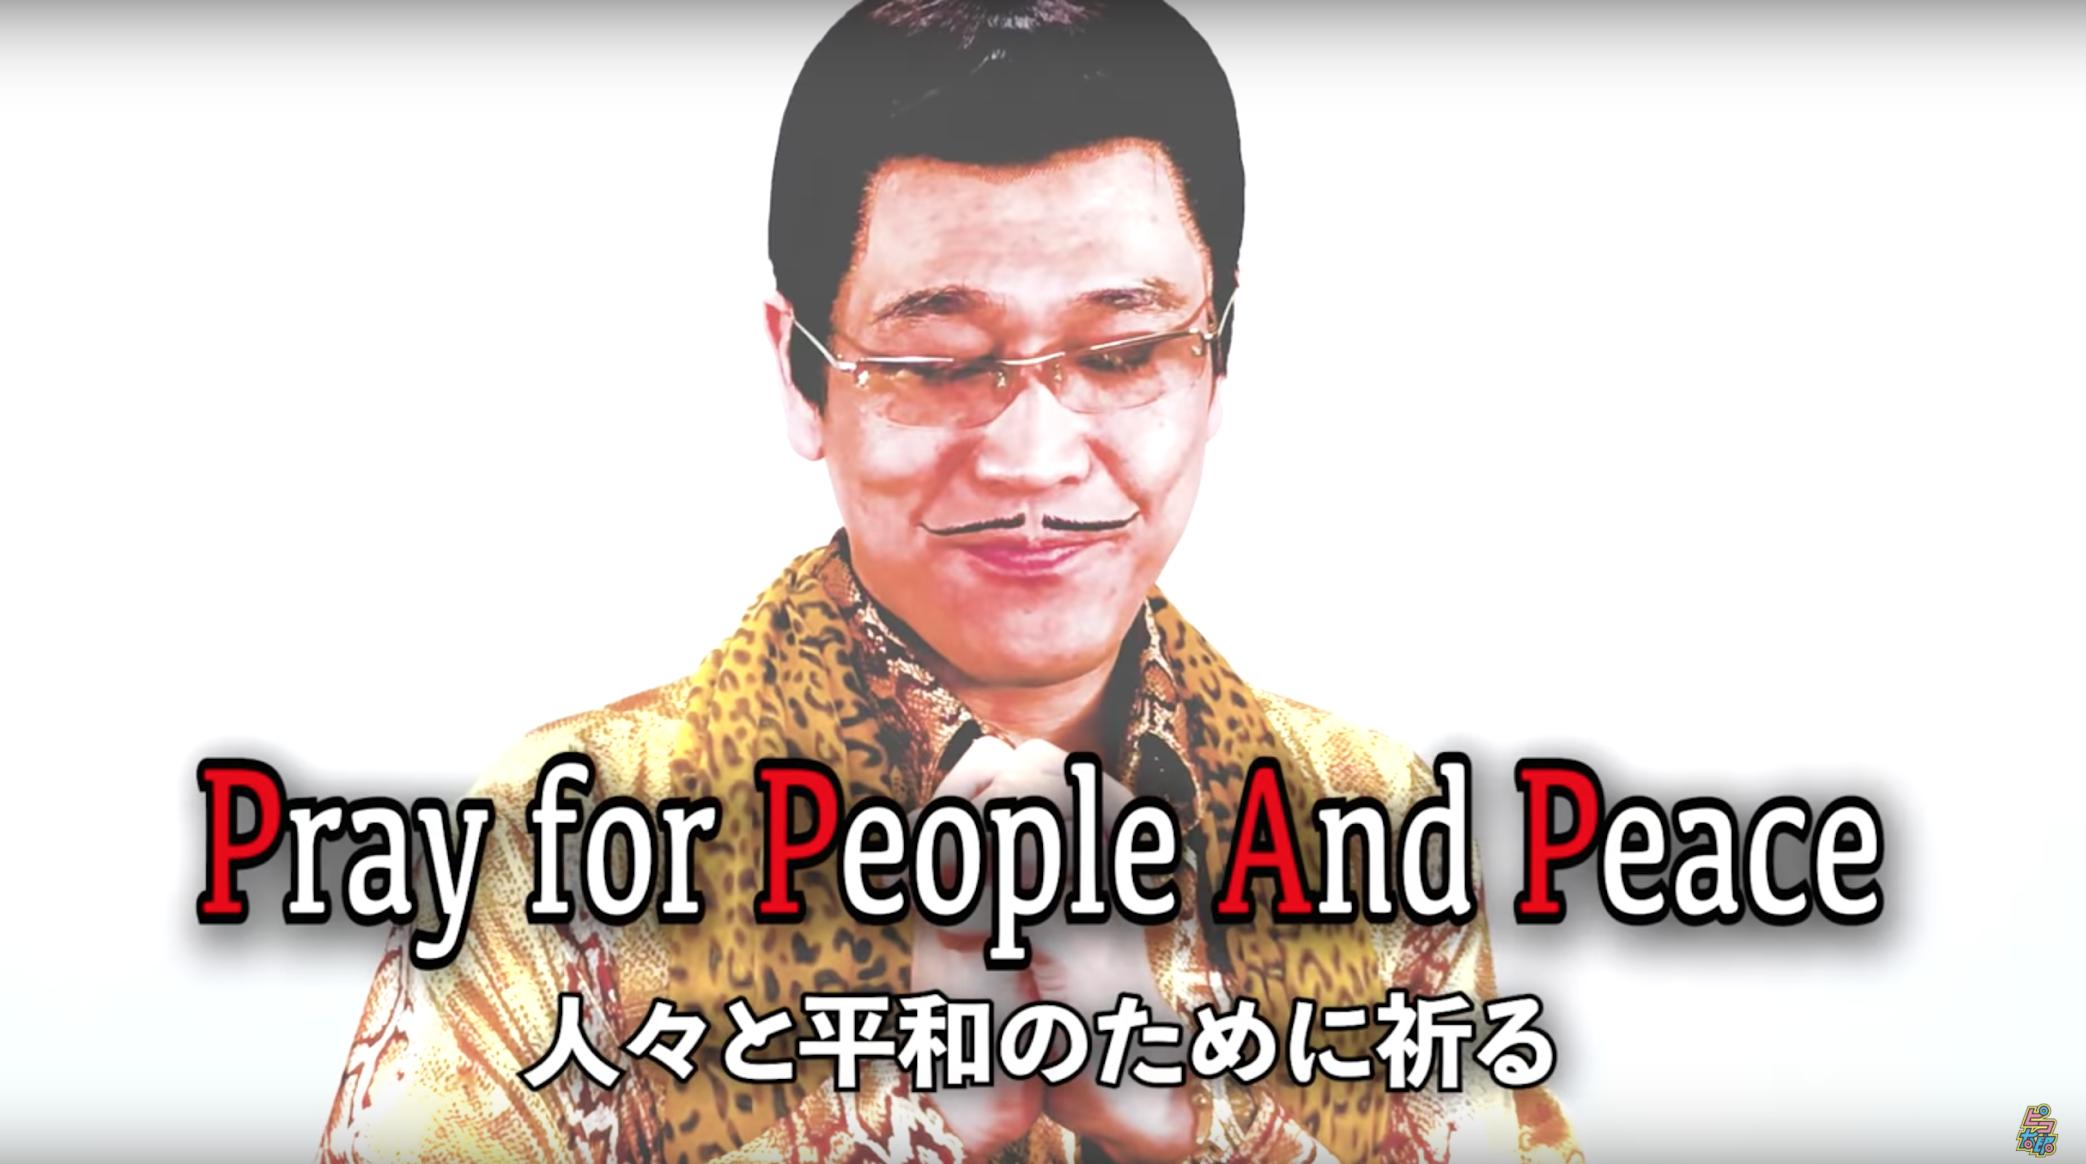 PIKO太郎( ピコ太郎 )公開〈 PPAP 〉最新版教大家 WASH!WASH!WASH!